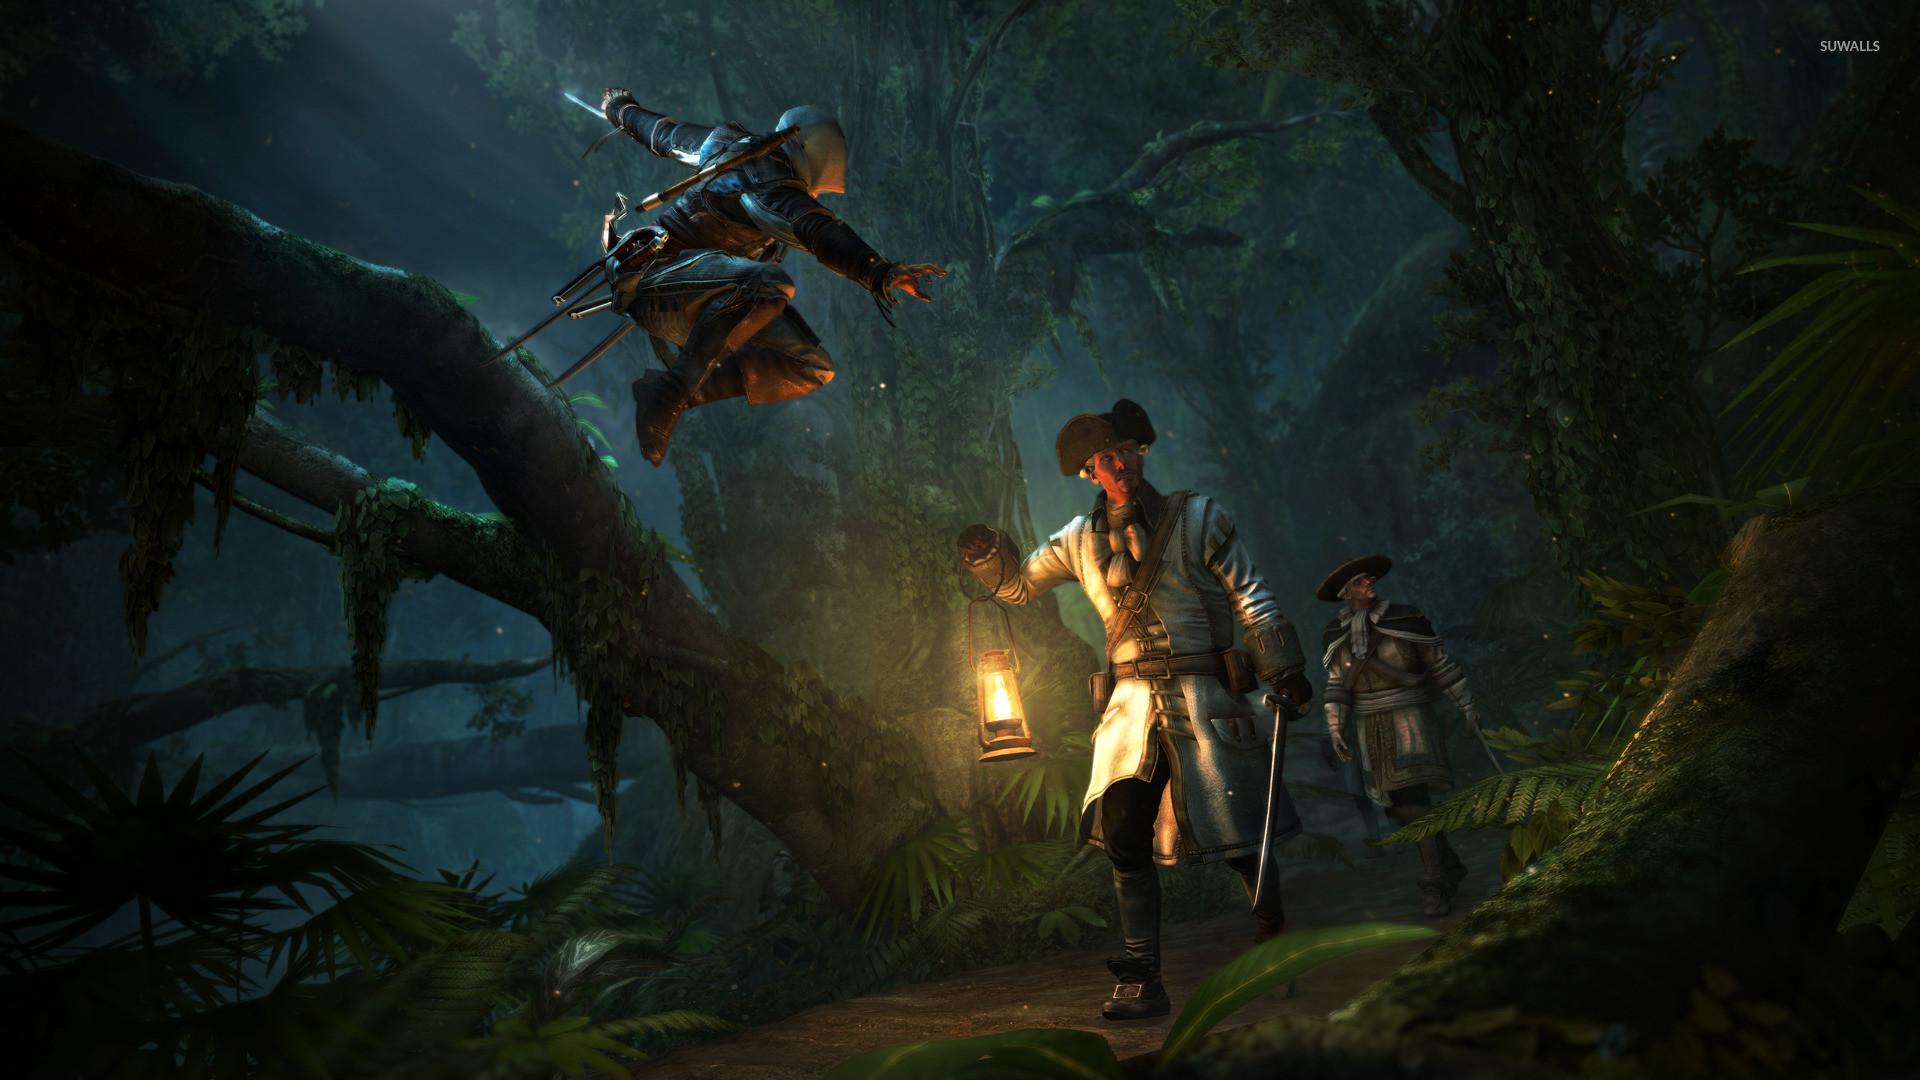 Assassin's Creed IV: Black Flag [14] wallpaper